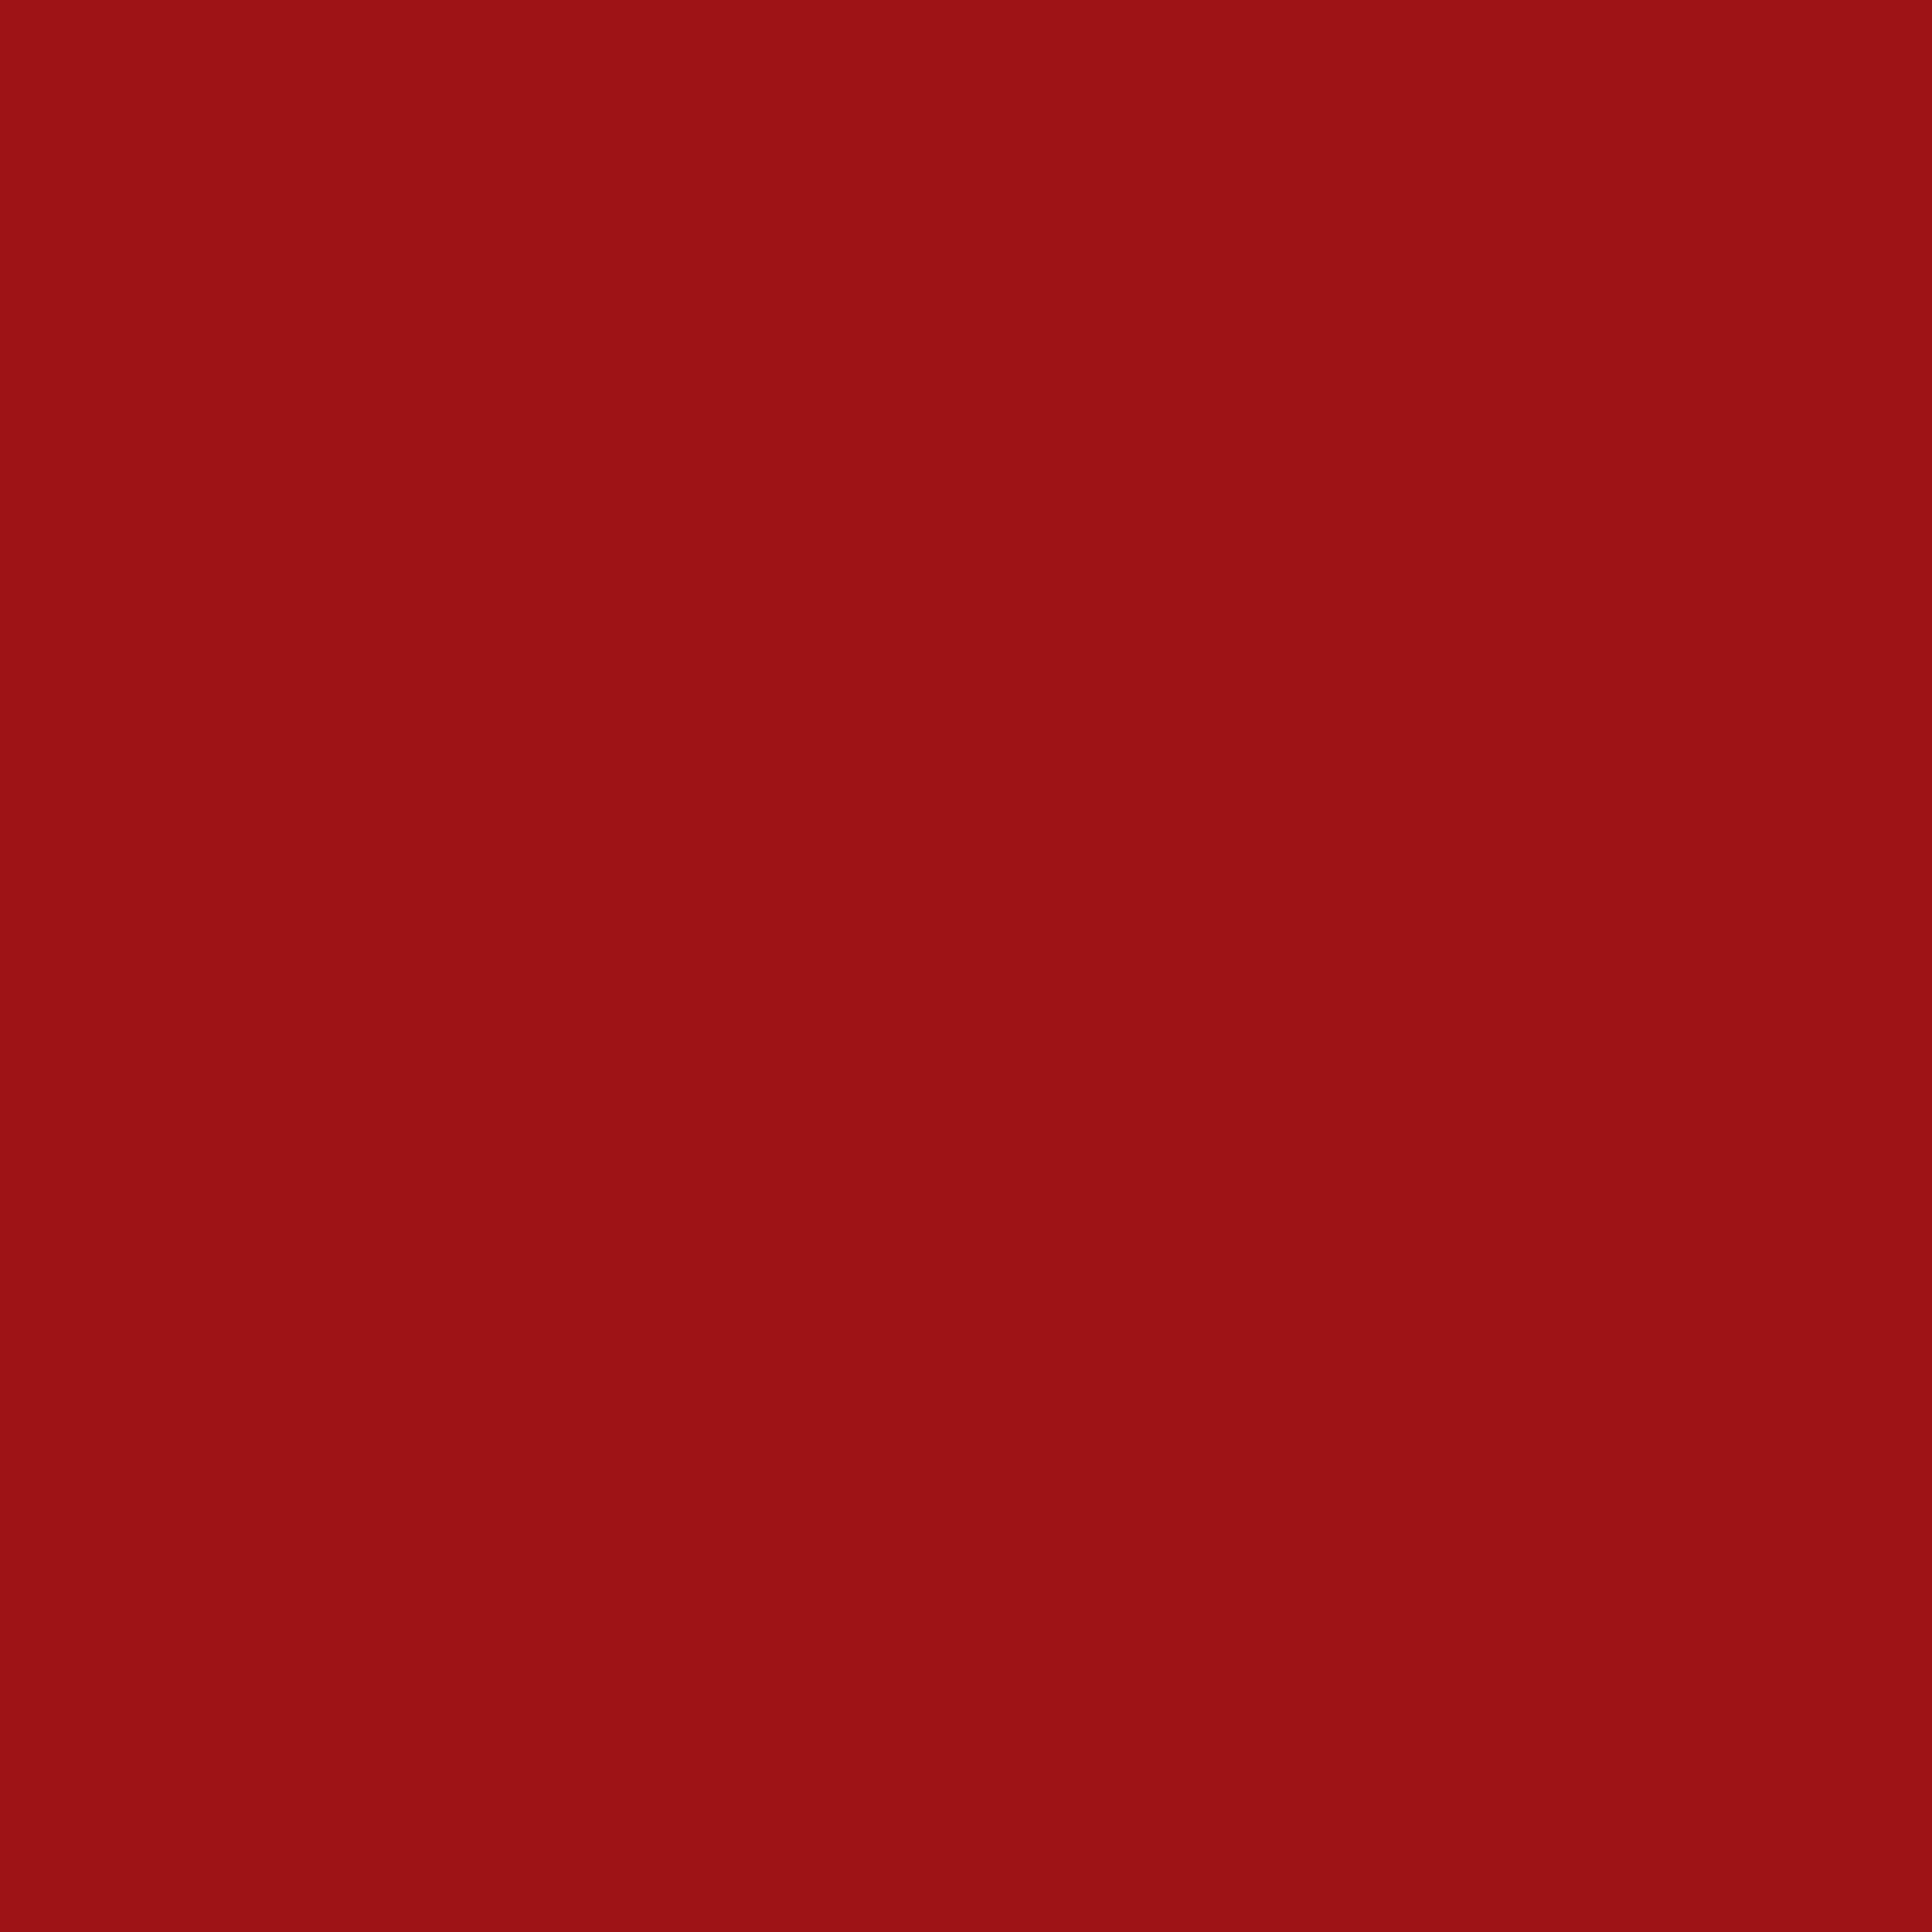 2732x2732 Spartan Crimson Solid Color Background